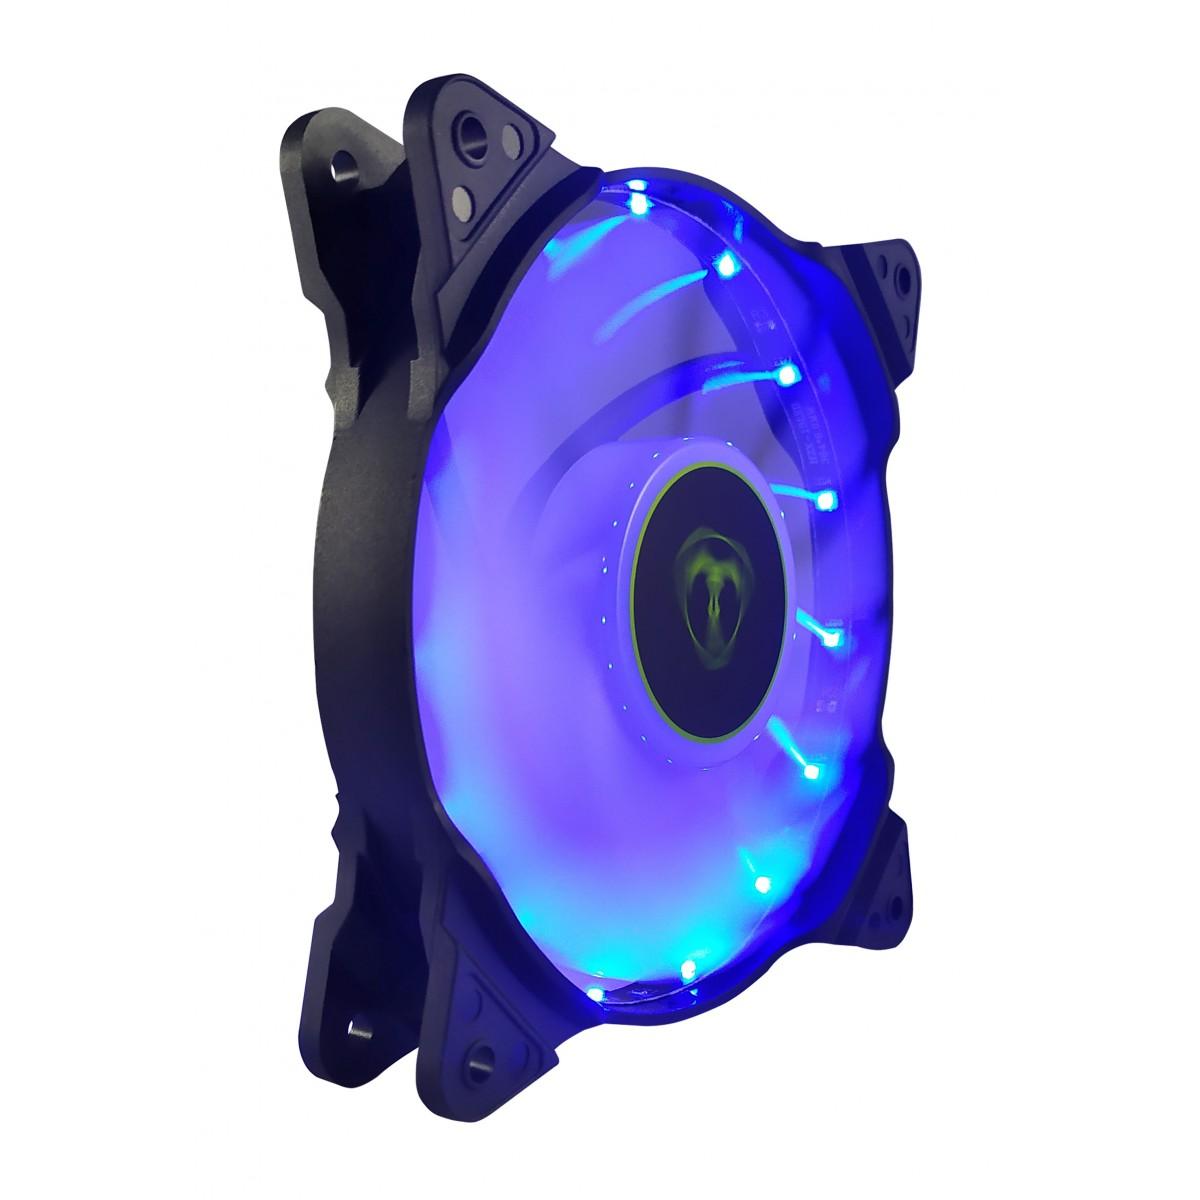 Cooler Para Gabinete T-Dagger 120mm, LED BLUE, T-TGF300-B